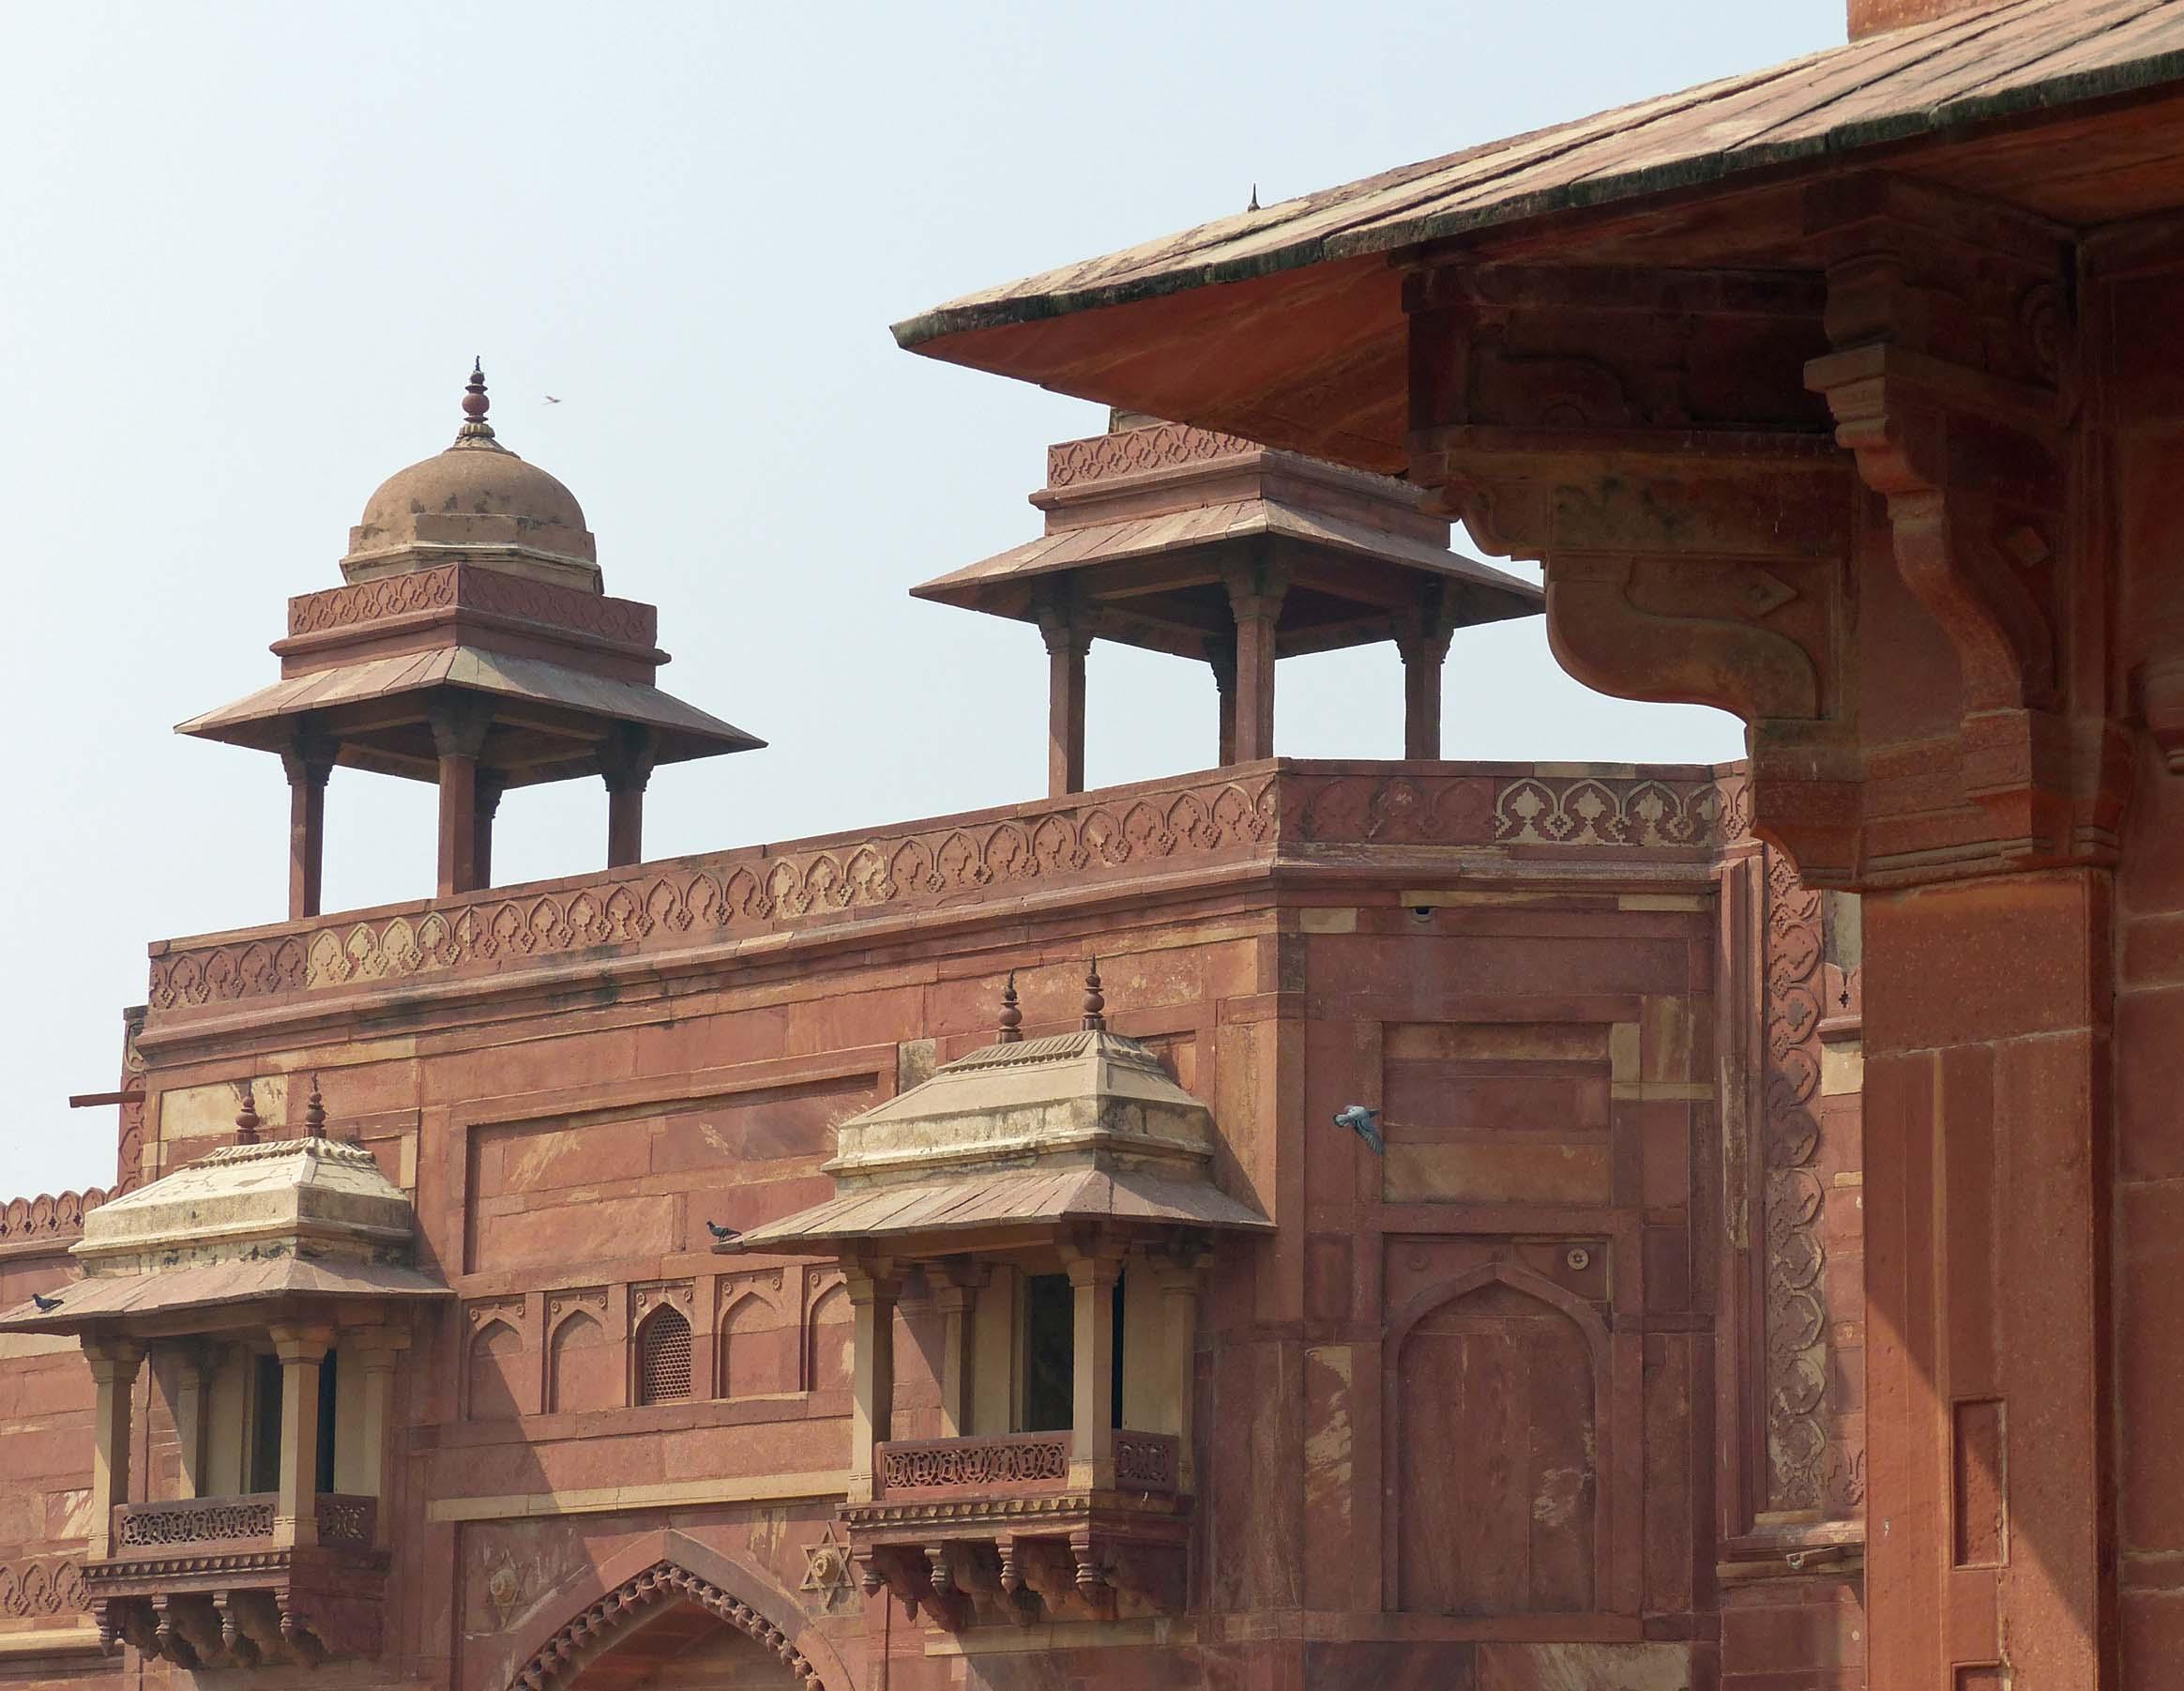 Ornate red sandstone building